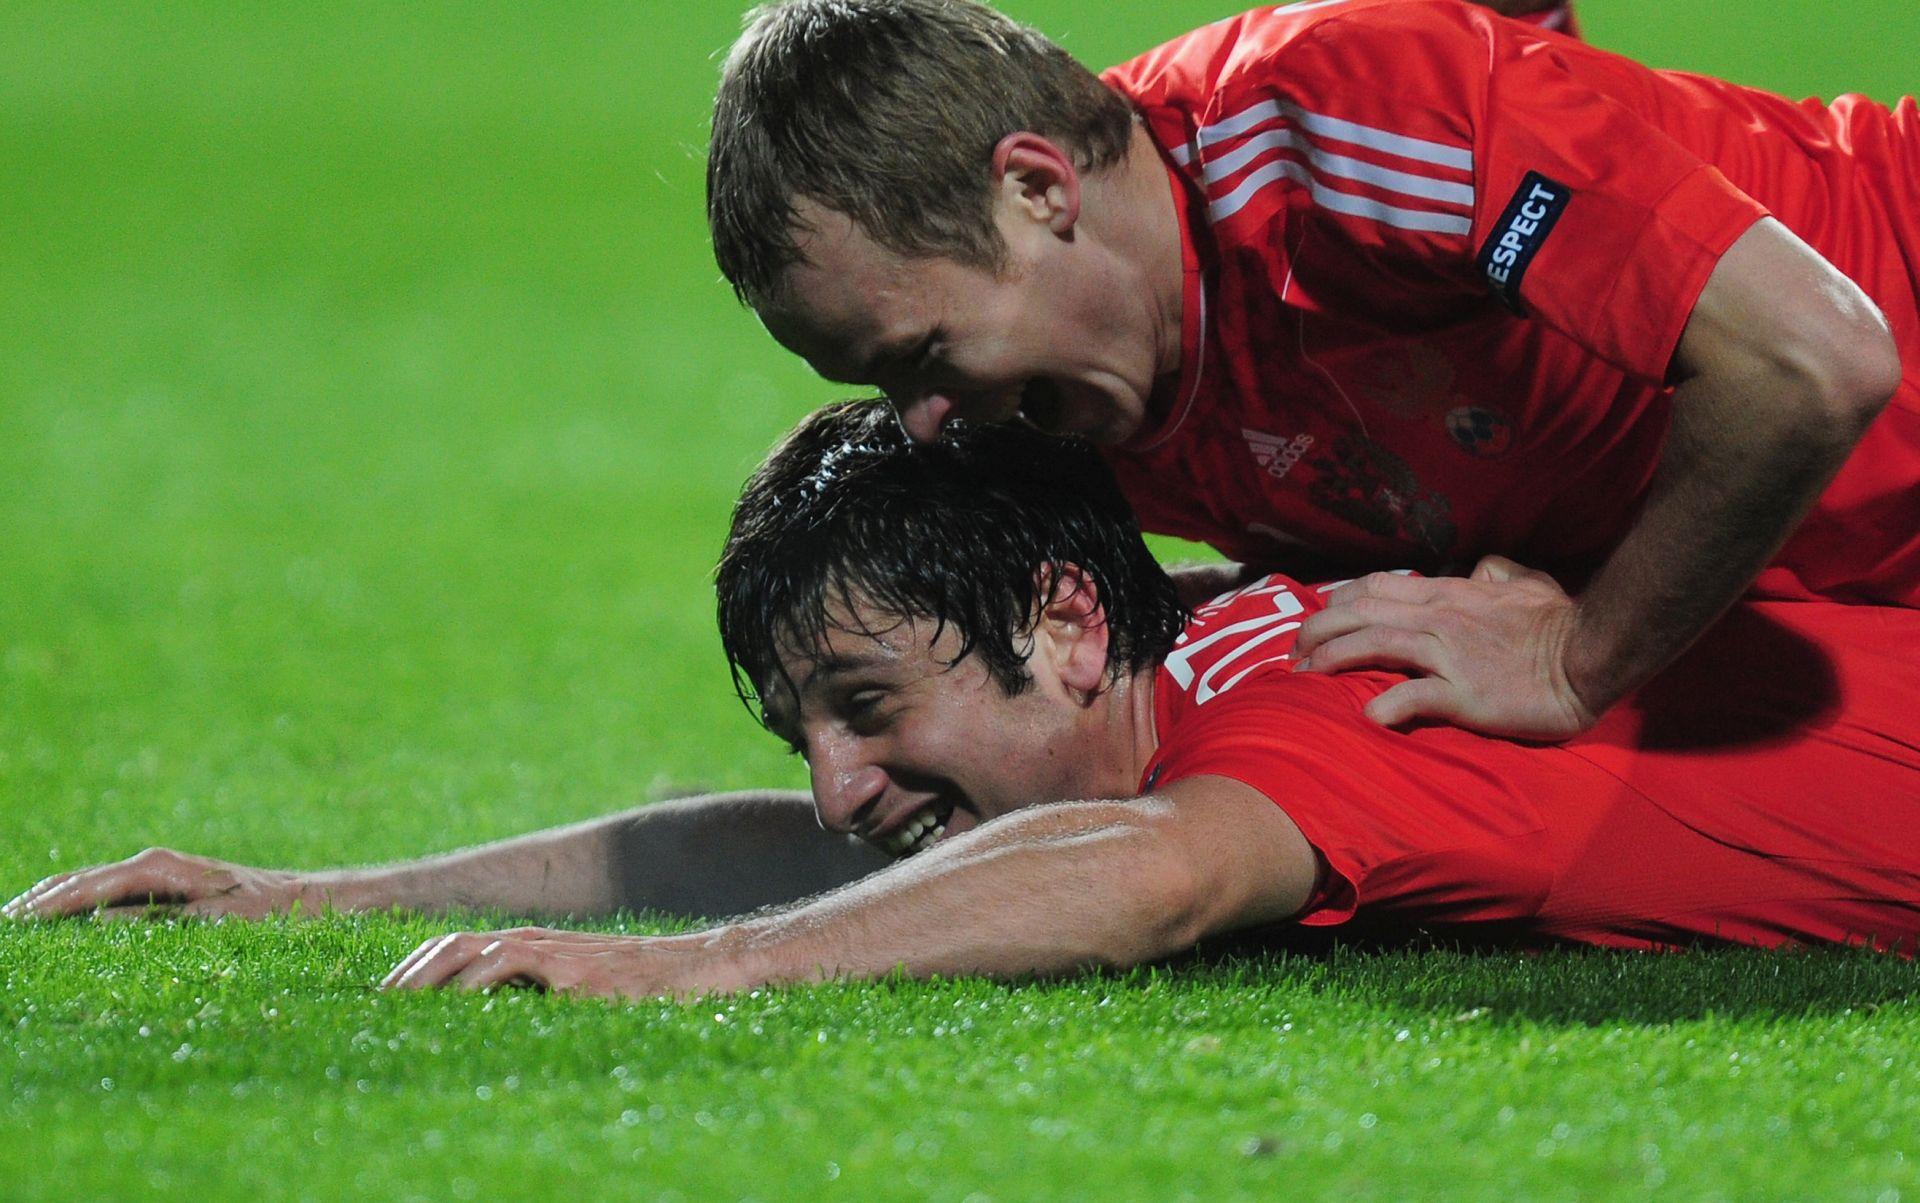 Liga prvaka: CSKA Moskva – Sparta Prag 2-2